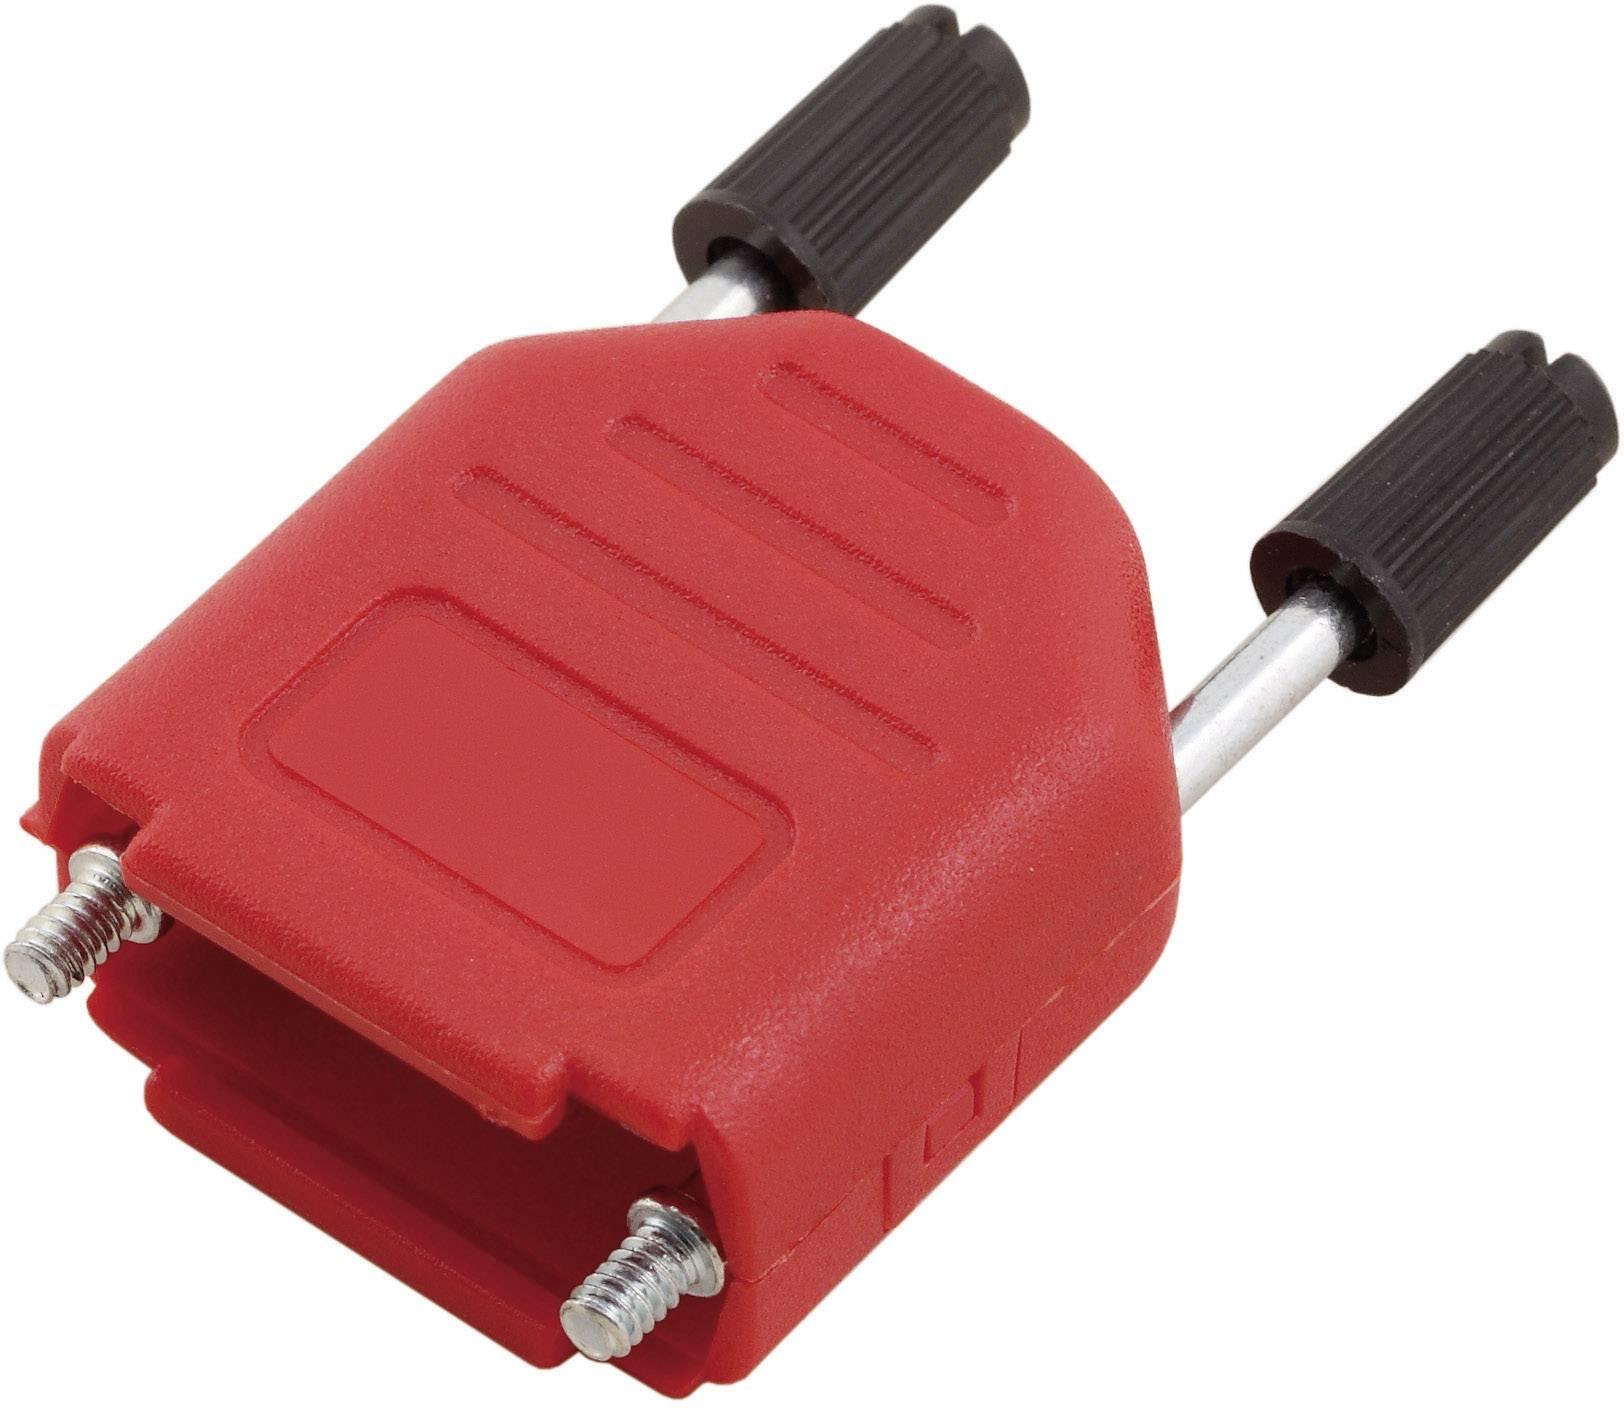 D-SUB púzdro MH Connectors MHDPPK09-R-K 6353-0103-01, Počet pinov: 9, plast, 180 °, červená, 1 ks